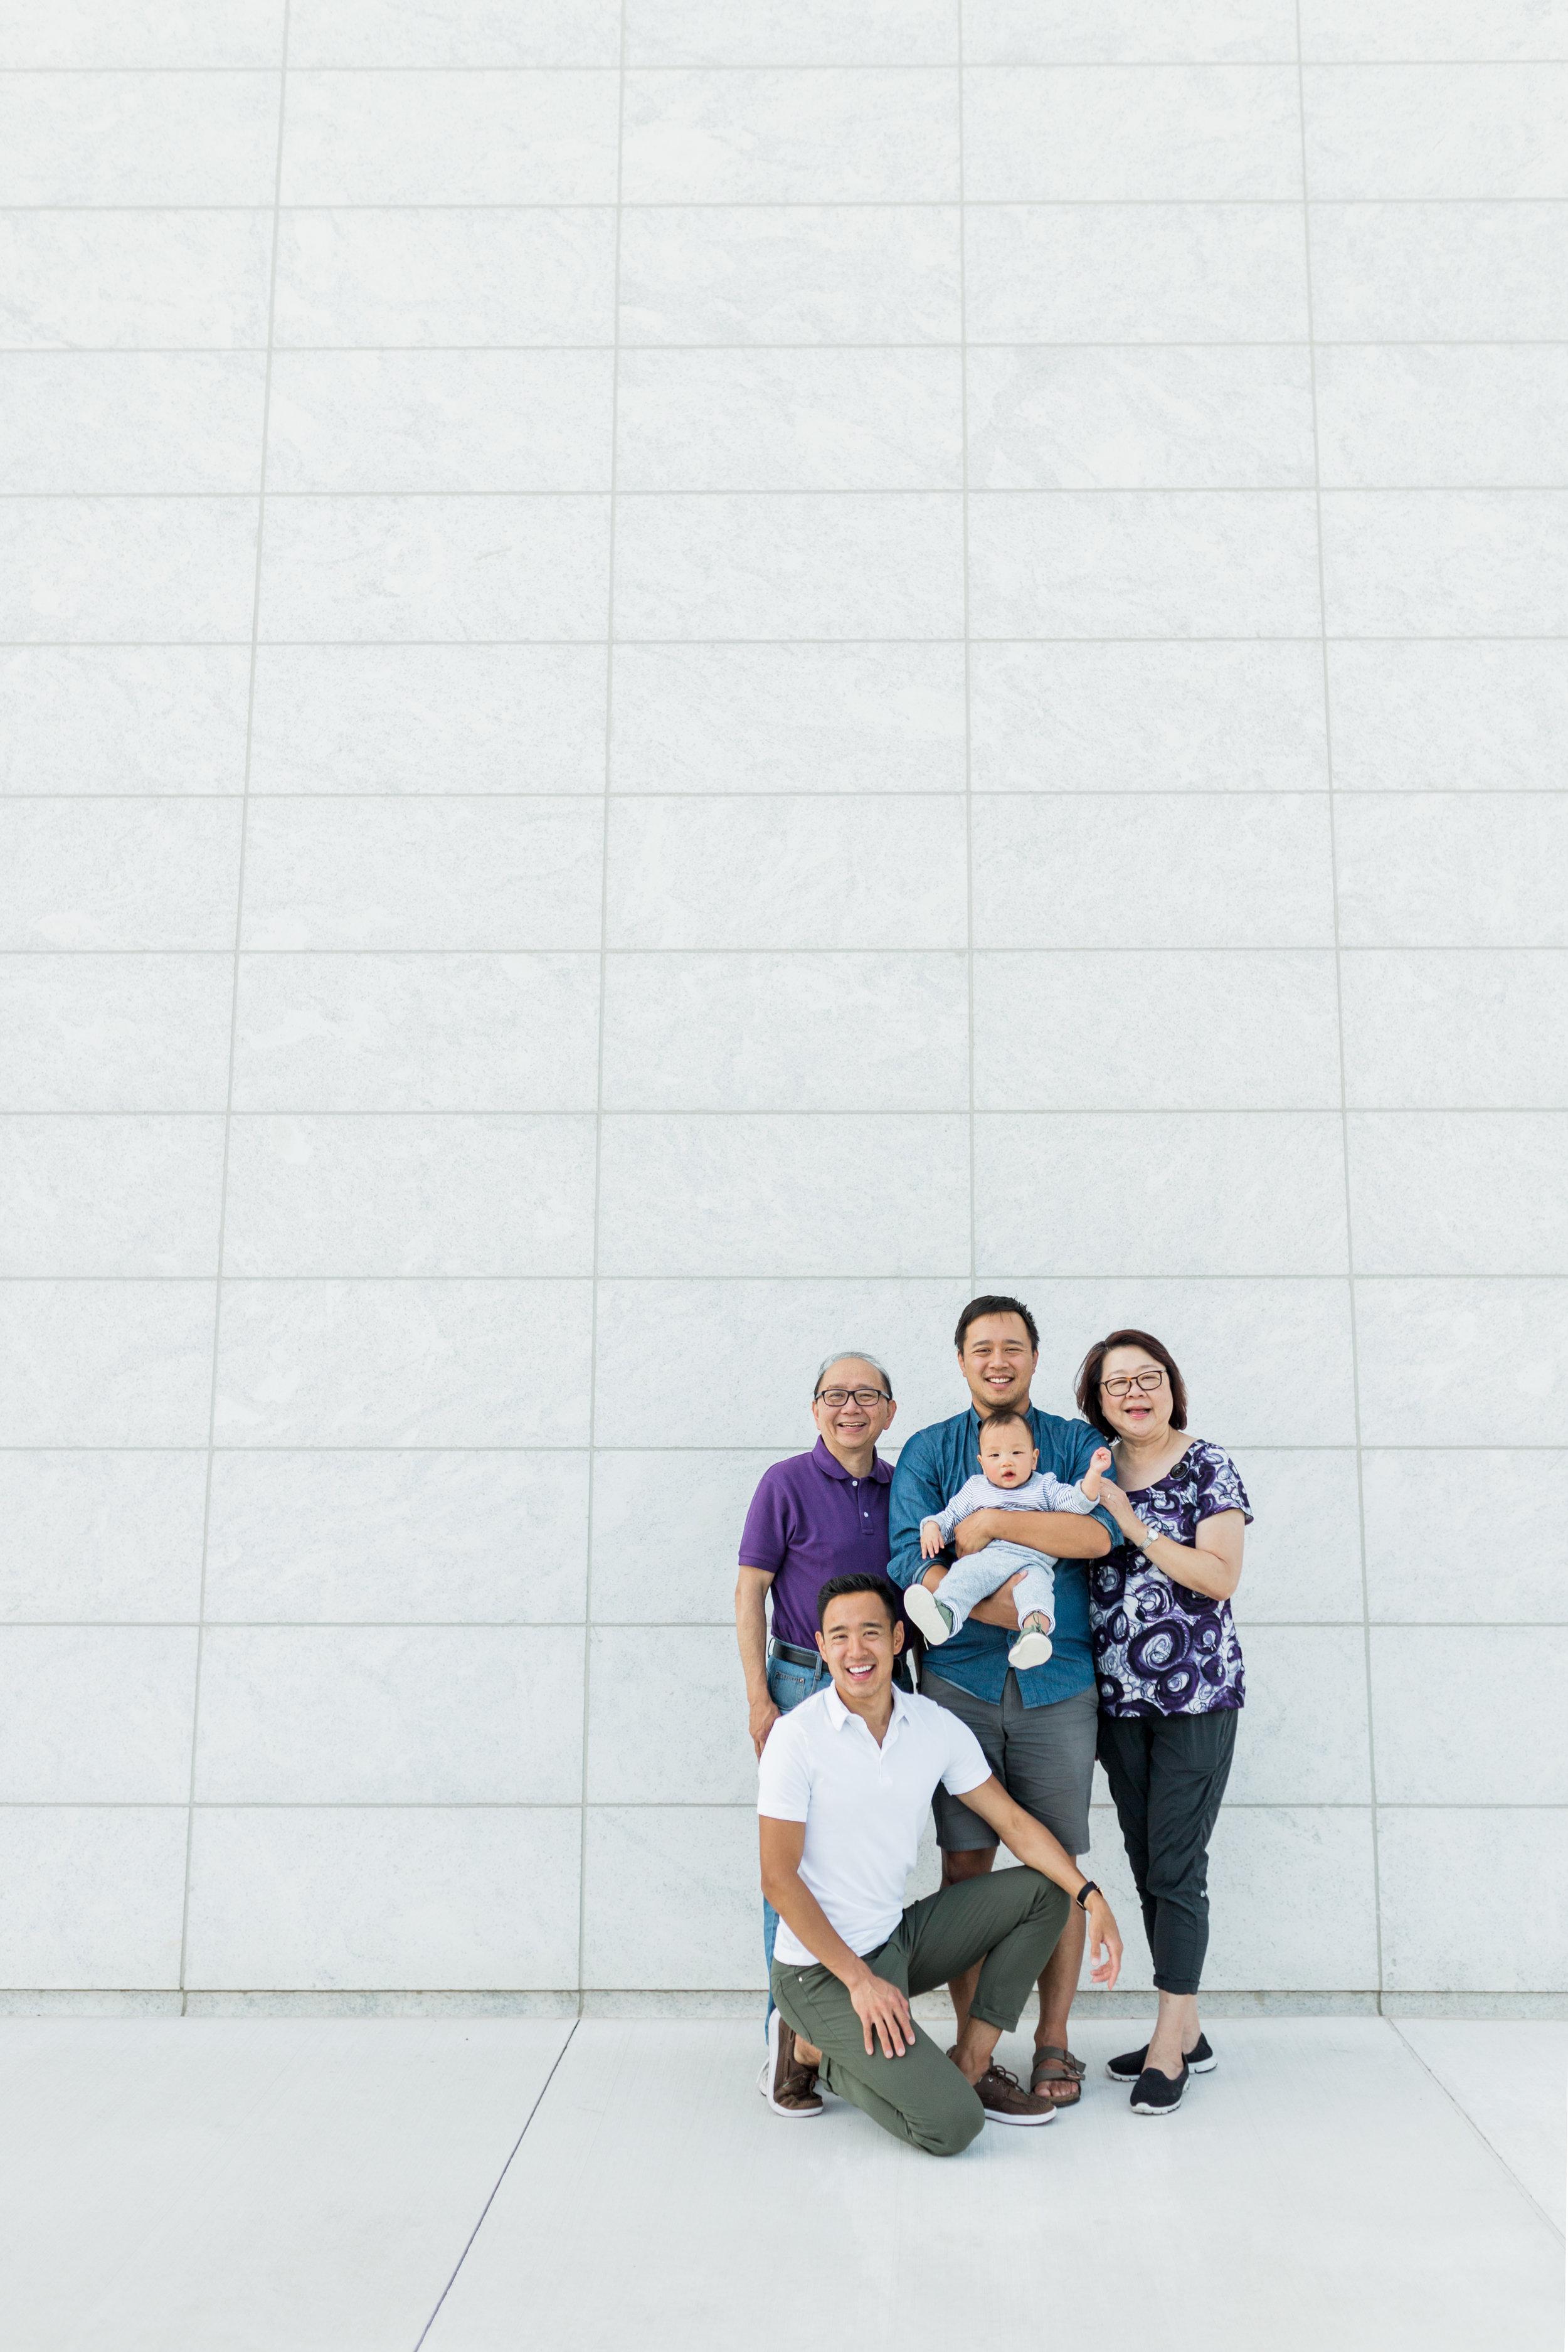 Aga Khan Museum Family Photos-38.jpg